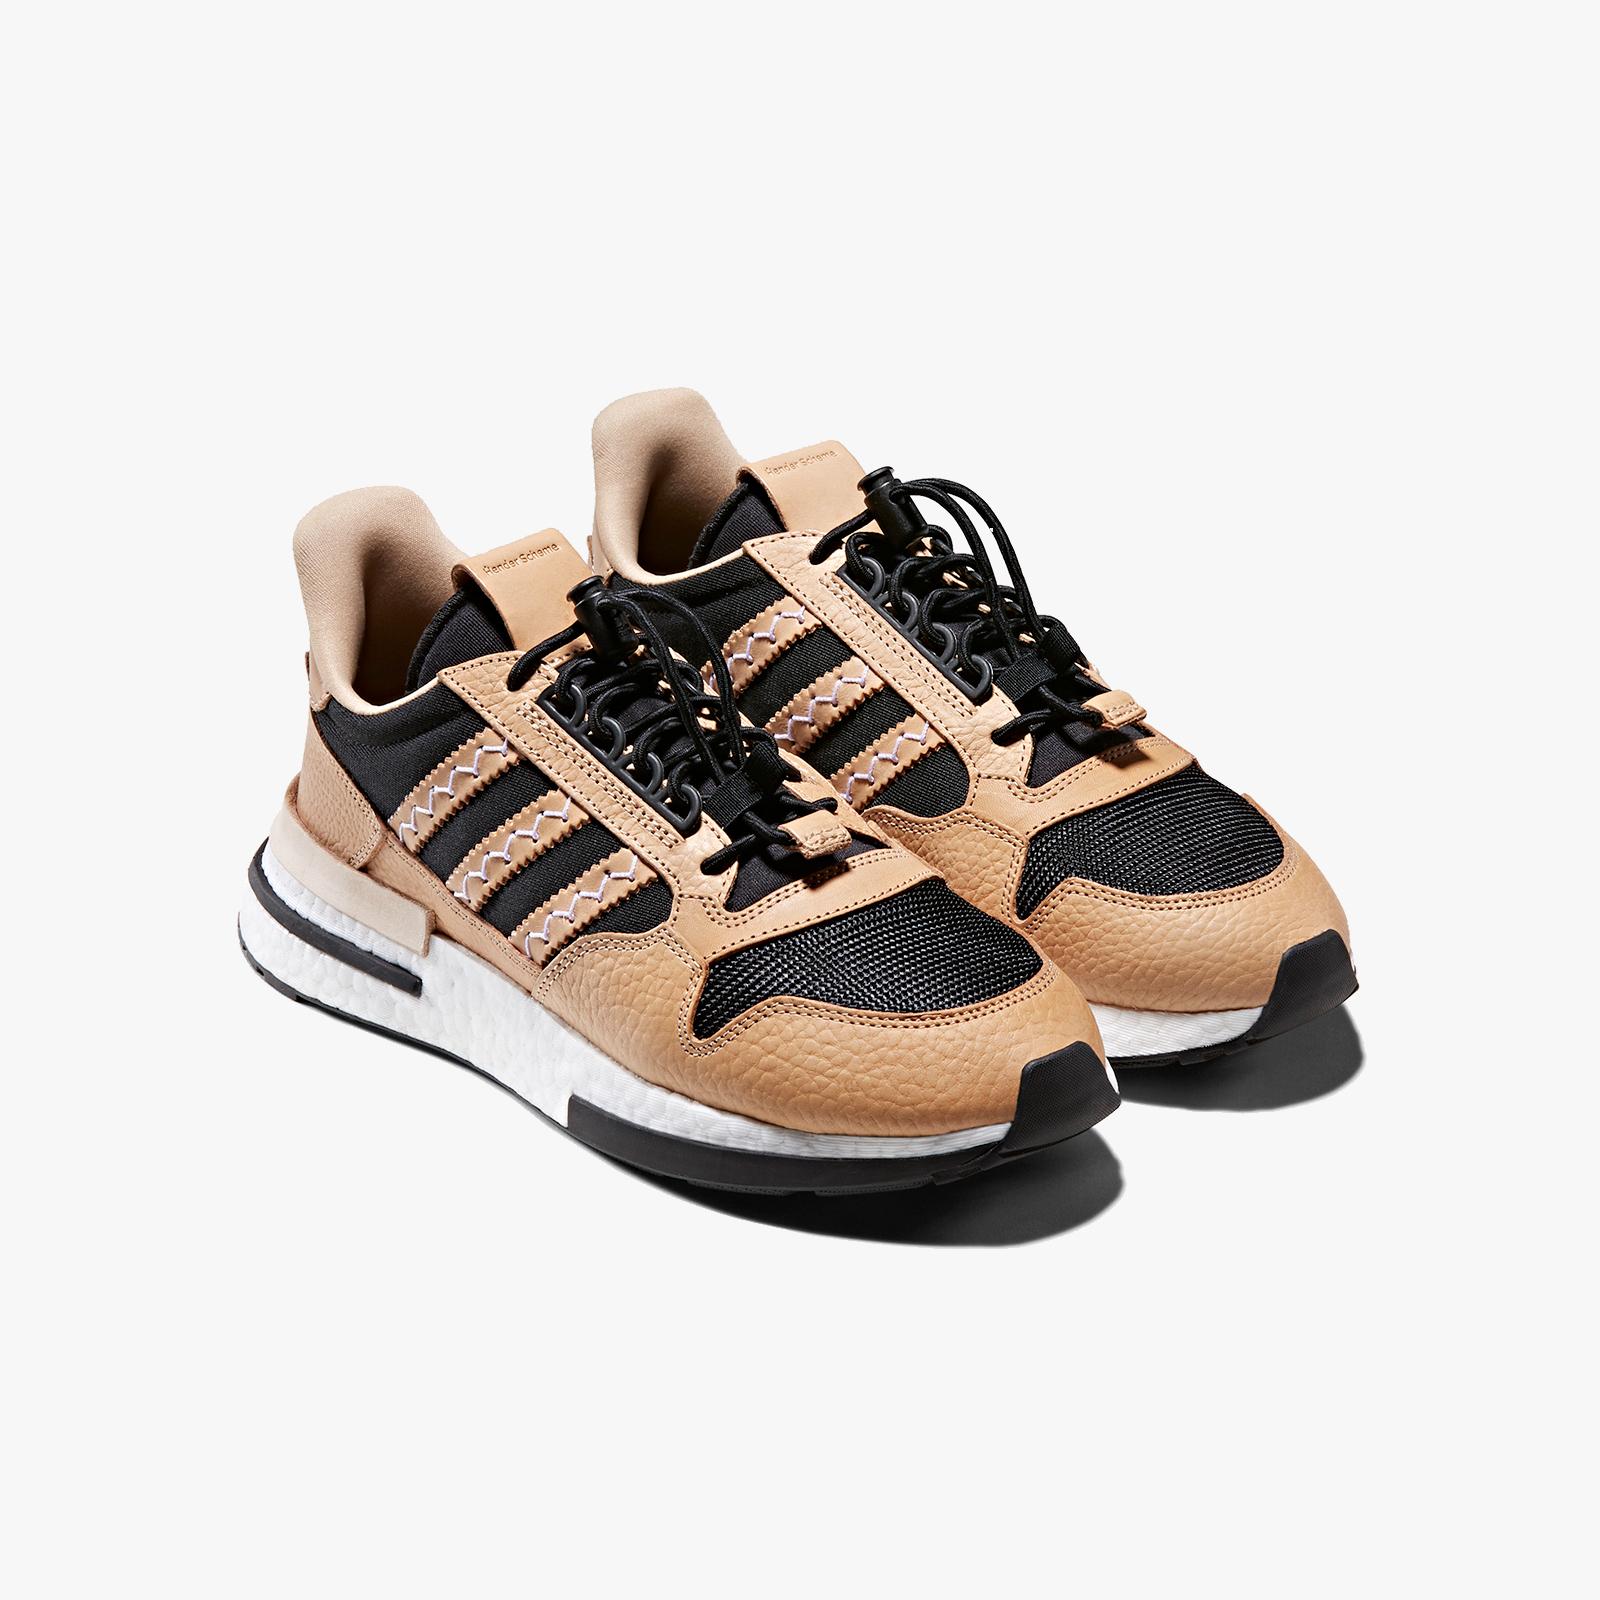 e05aef3b3e2e0 adidas ZX 500 RM MT x Hender Scheme - F36045 - Sneakersnstuff ...